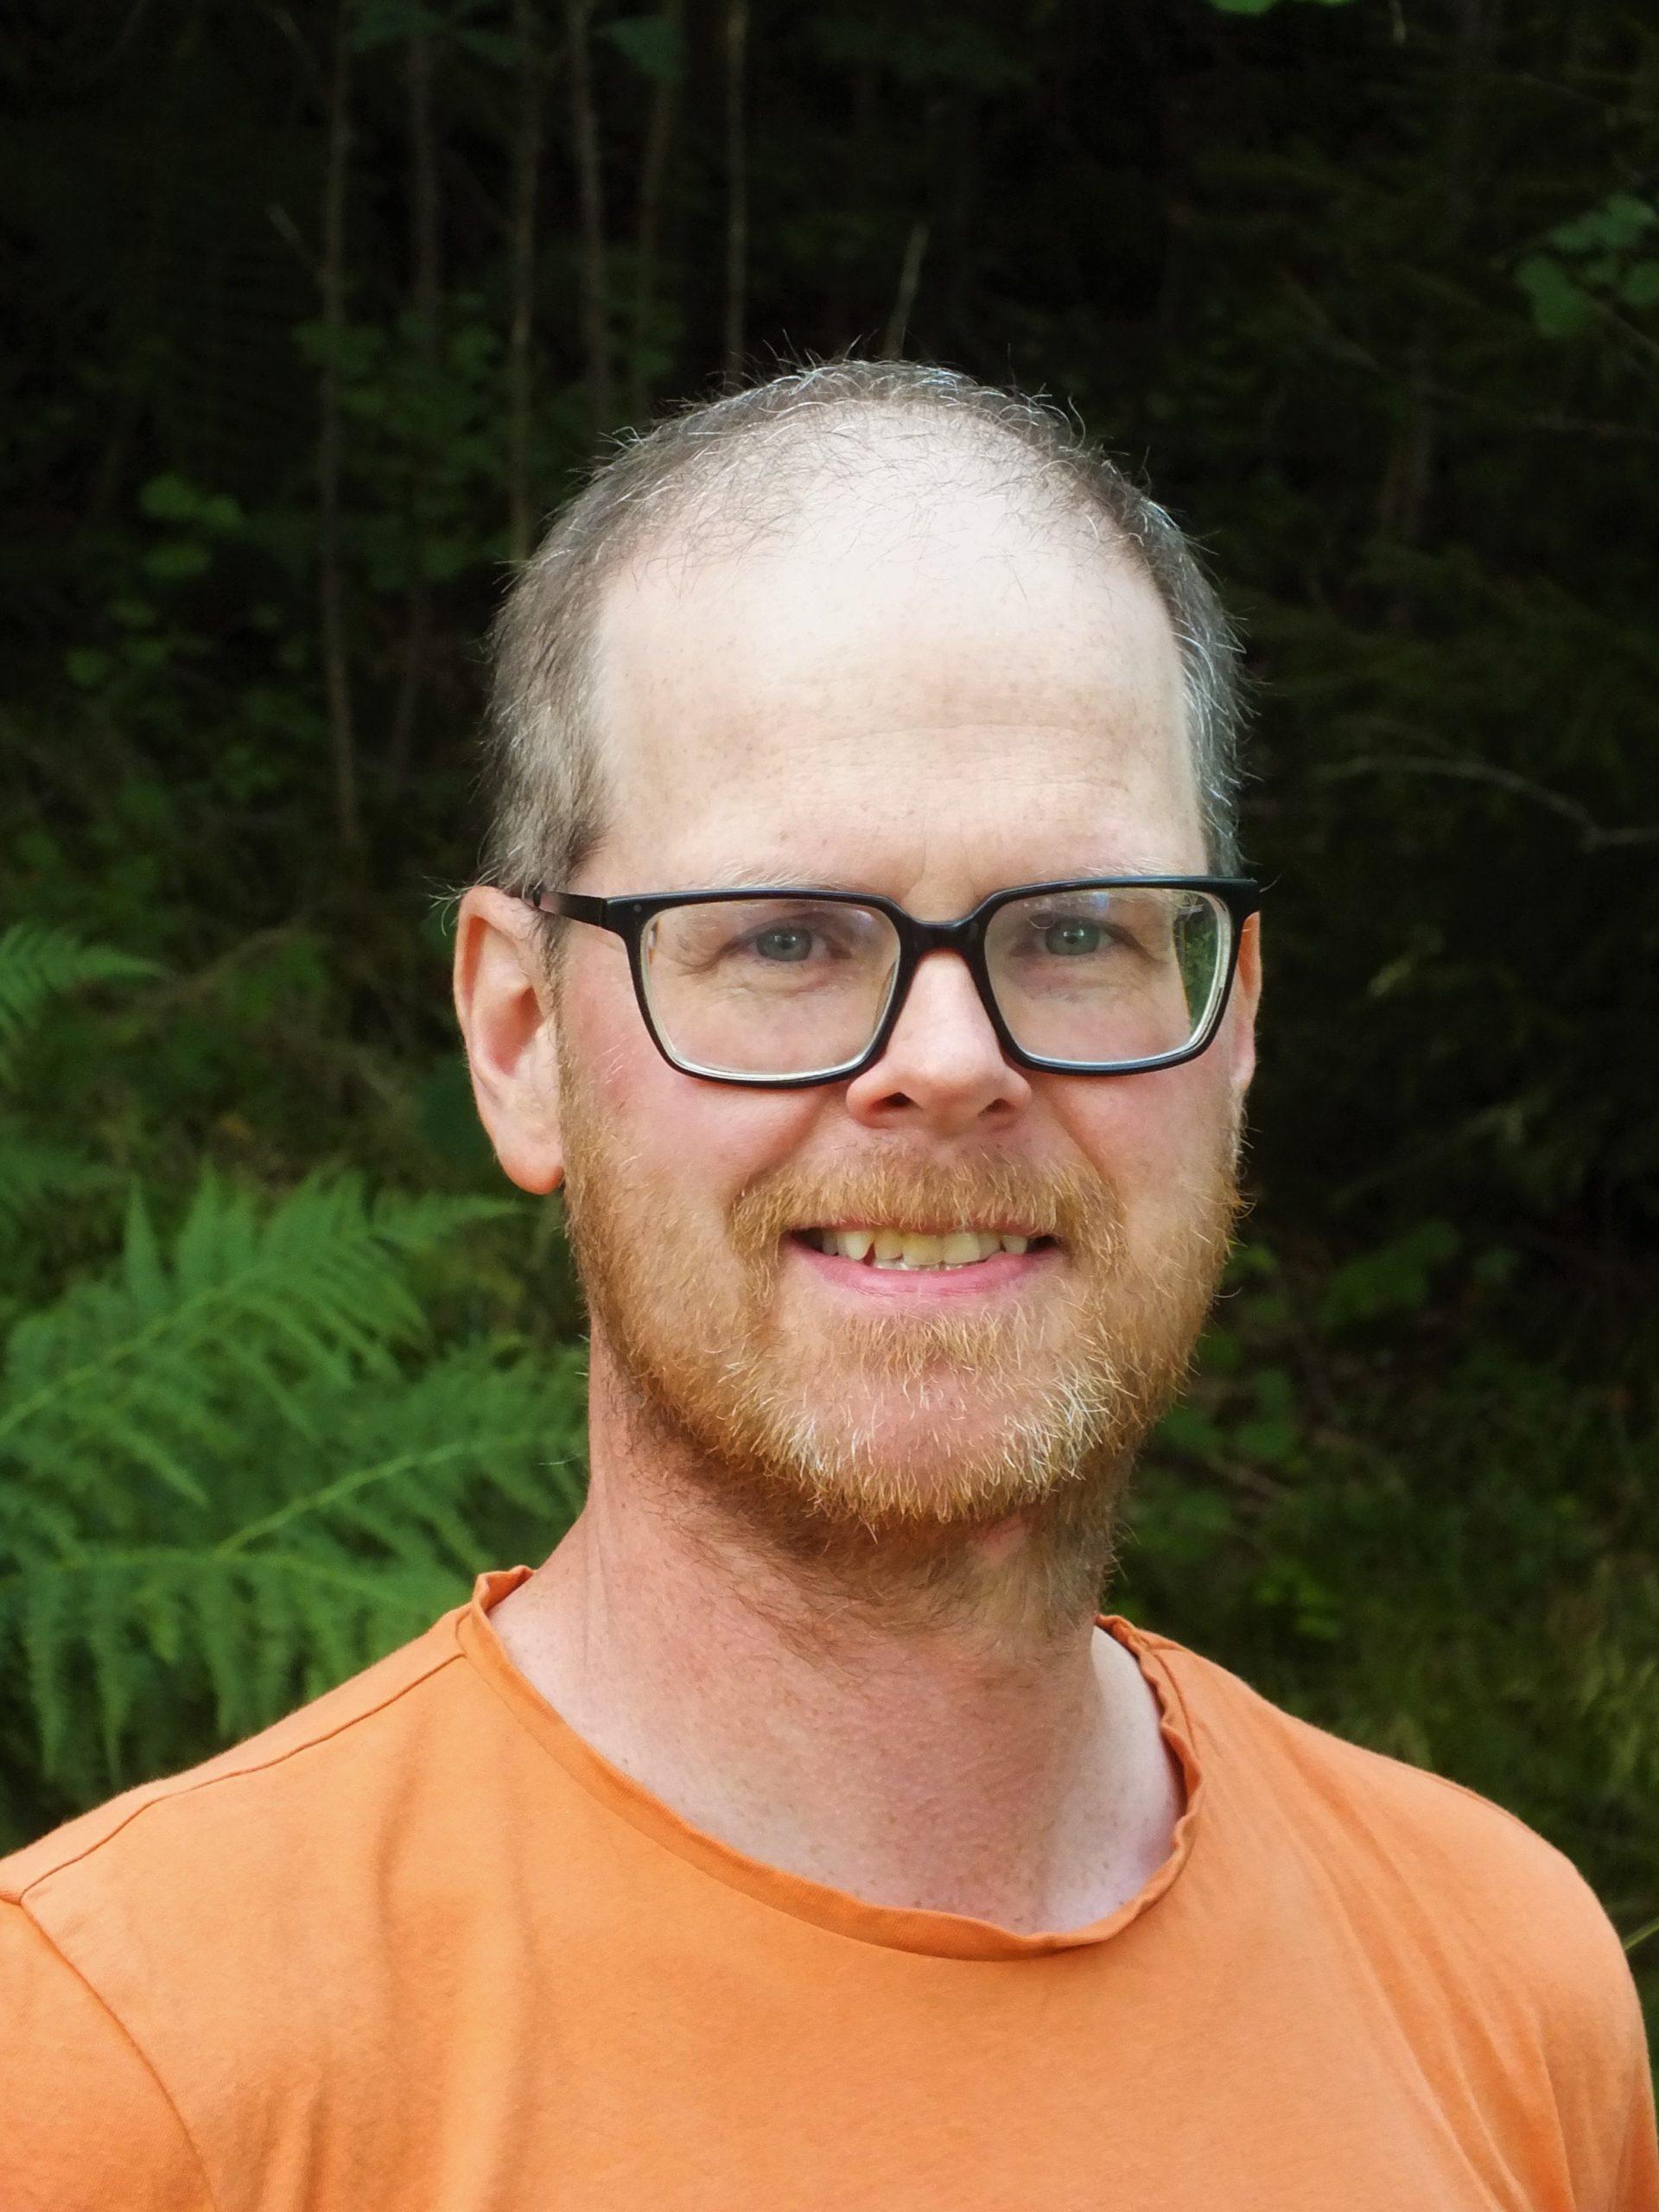 Michael Johansson